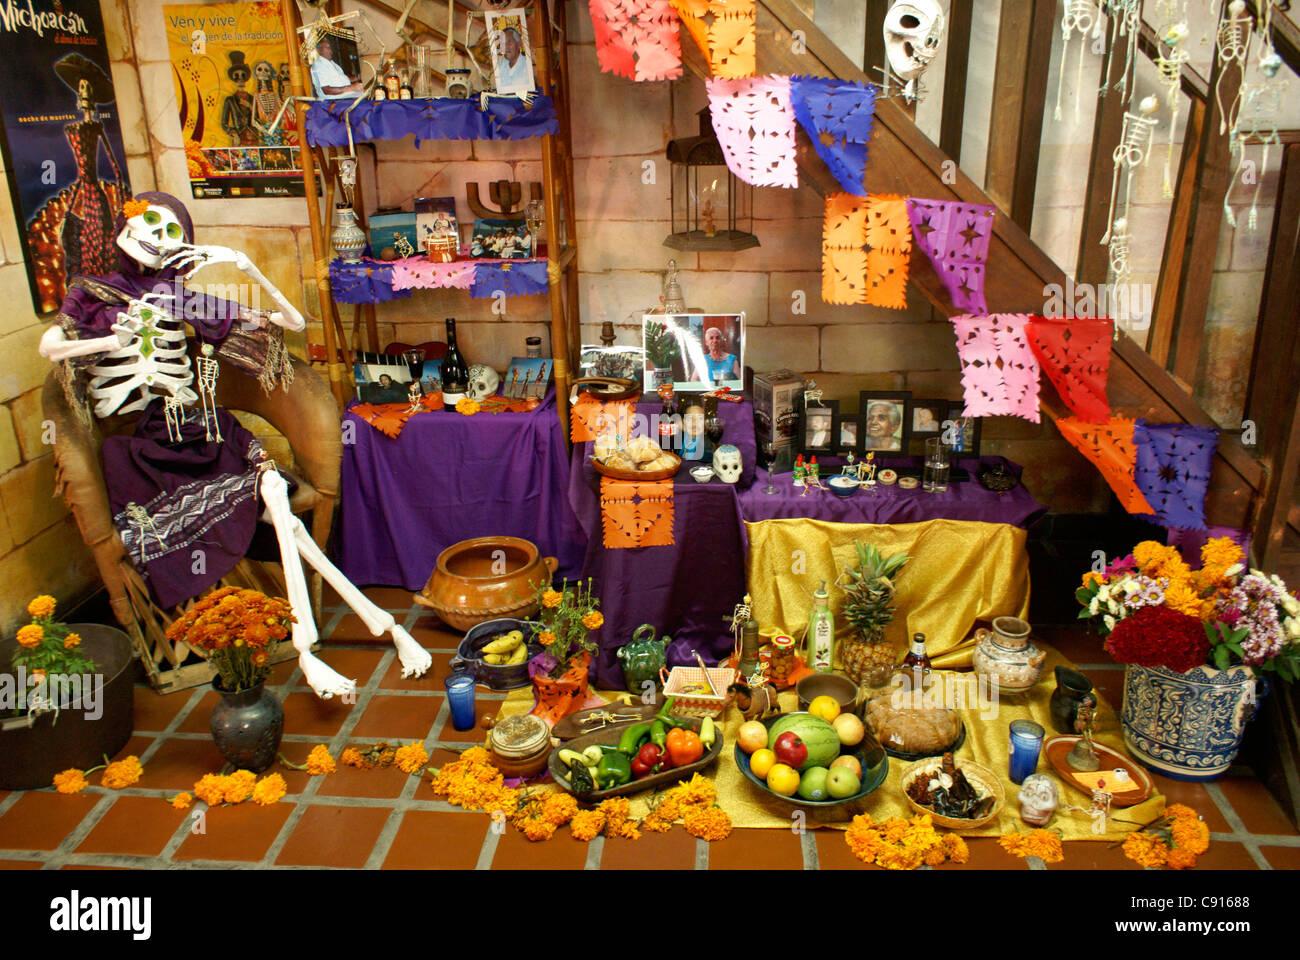 Dekorierte mexikanischen Tag der Toten oder Dia de Los Muertos Altäre, Mazatlan, Sinaloa, Mexiko Stockbild